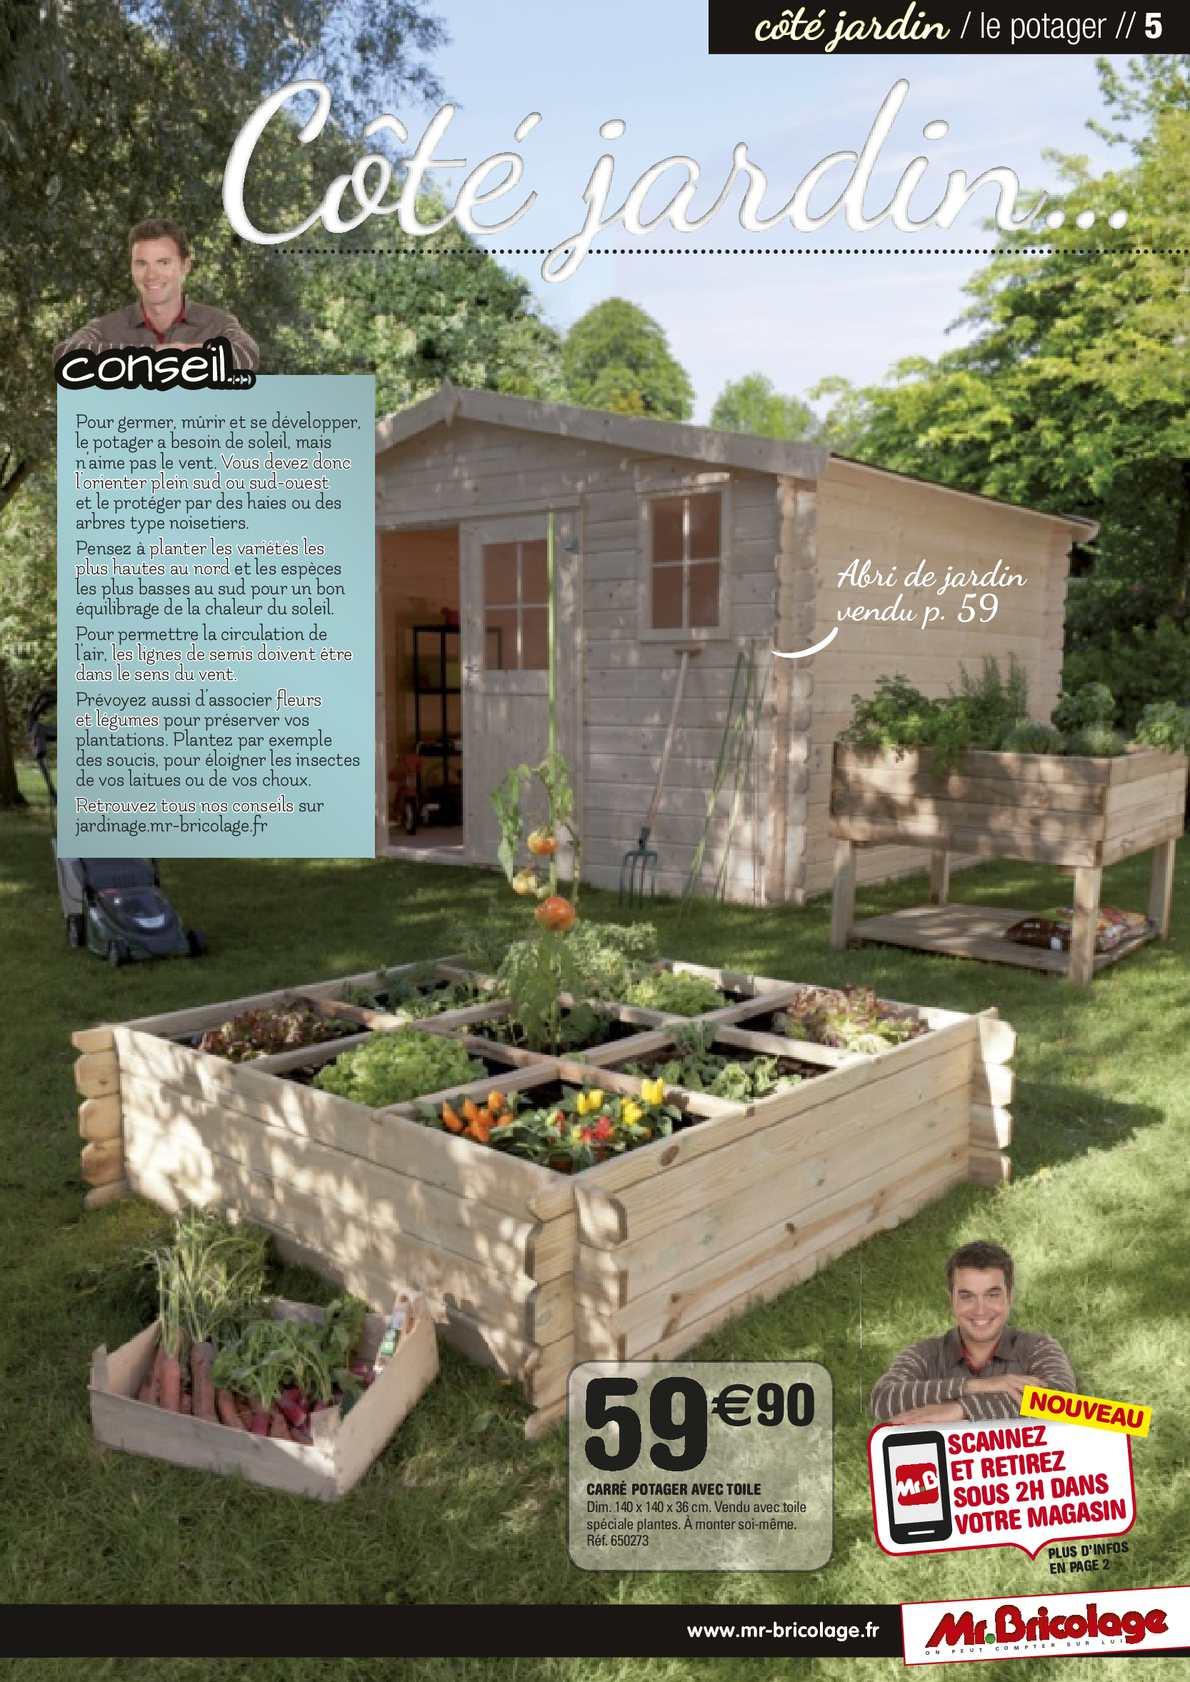 Guide Jardin 2014 Mr.bricolage - Calameo Downloader tout Abri De Jardin Mr Bricolage